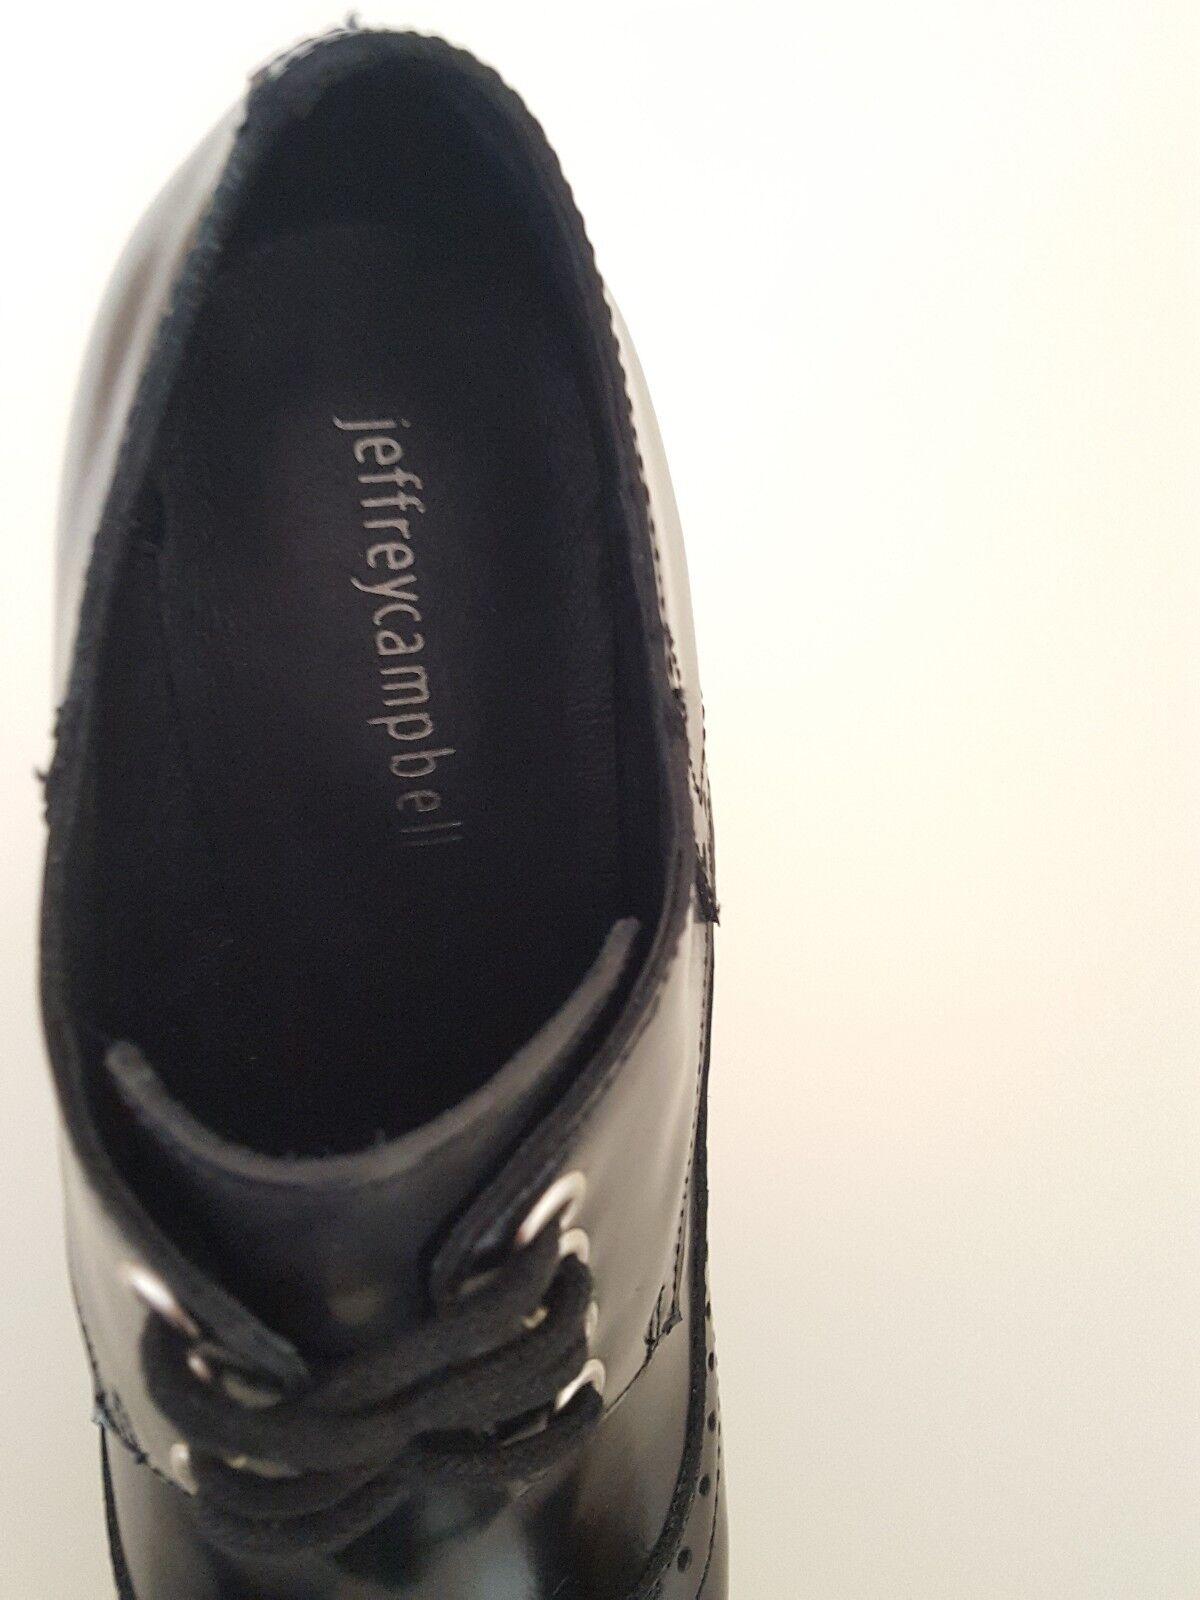 JEFFREY CAMPBELL POMEROY BLACK HEELS LEATHER BROGUE HEELS BLACK SIZE 4UK 53e0c9